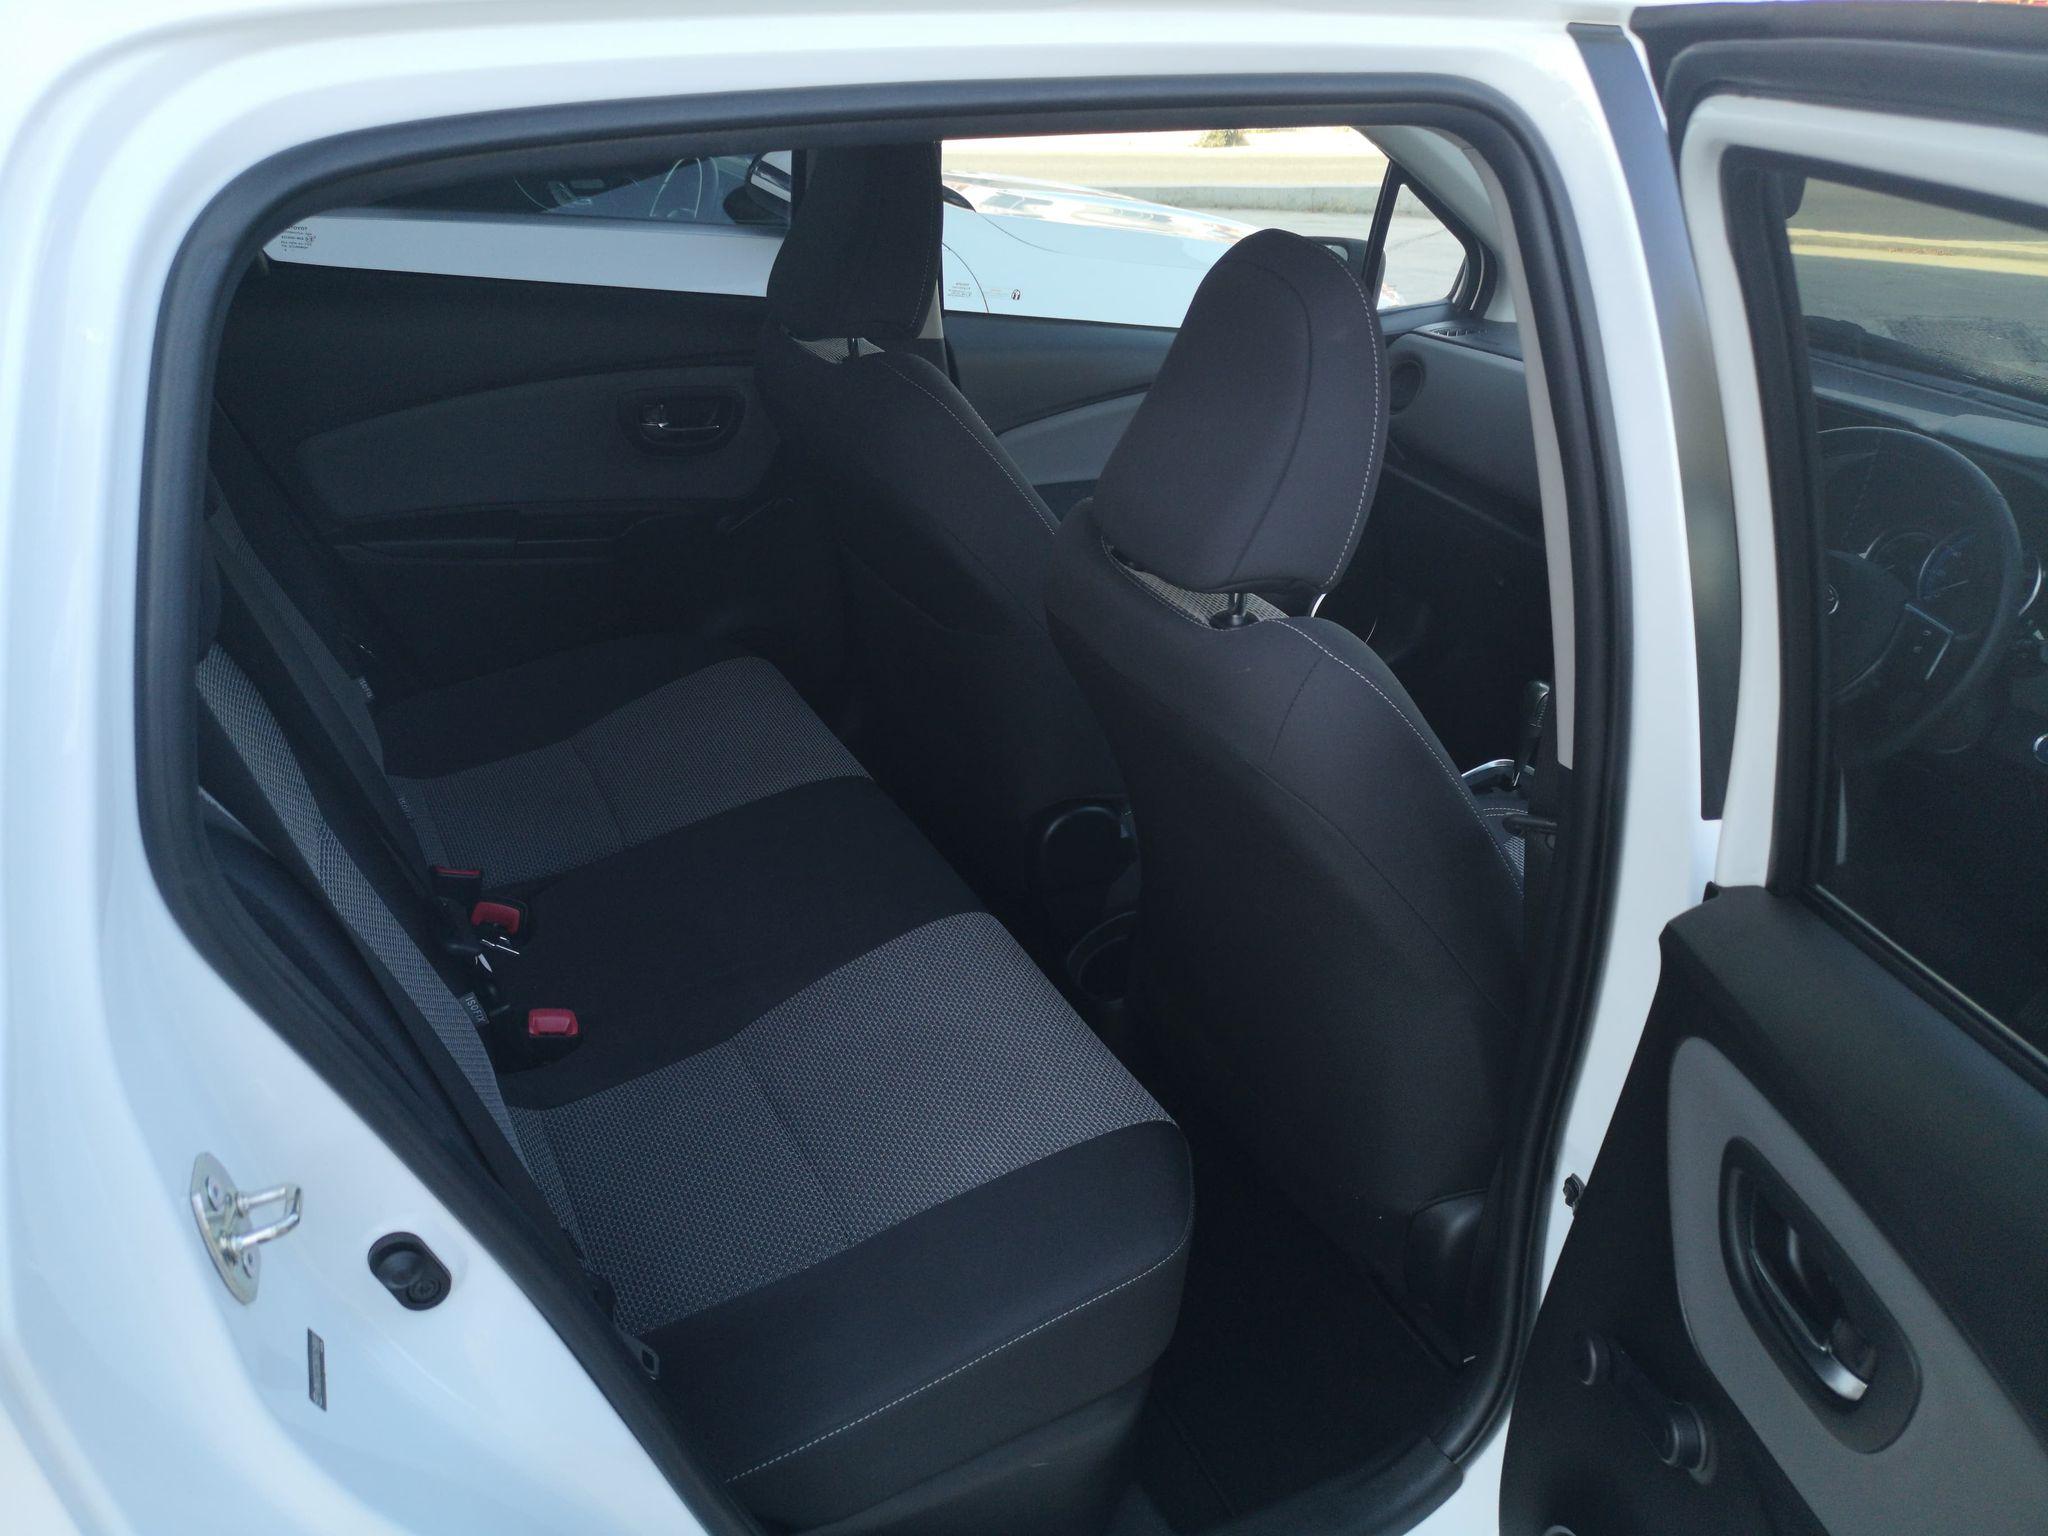 Toyota Yaris Hybrid 1.5L